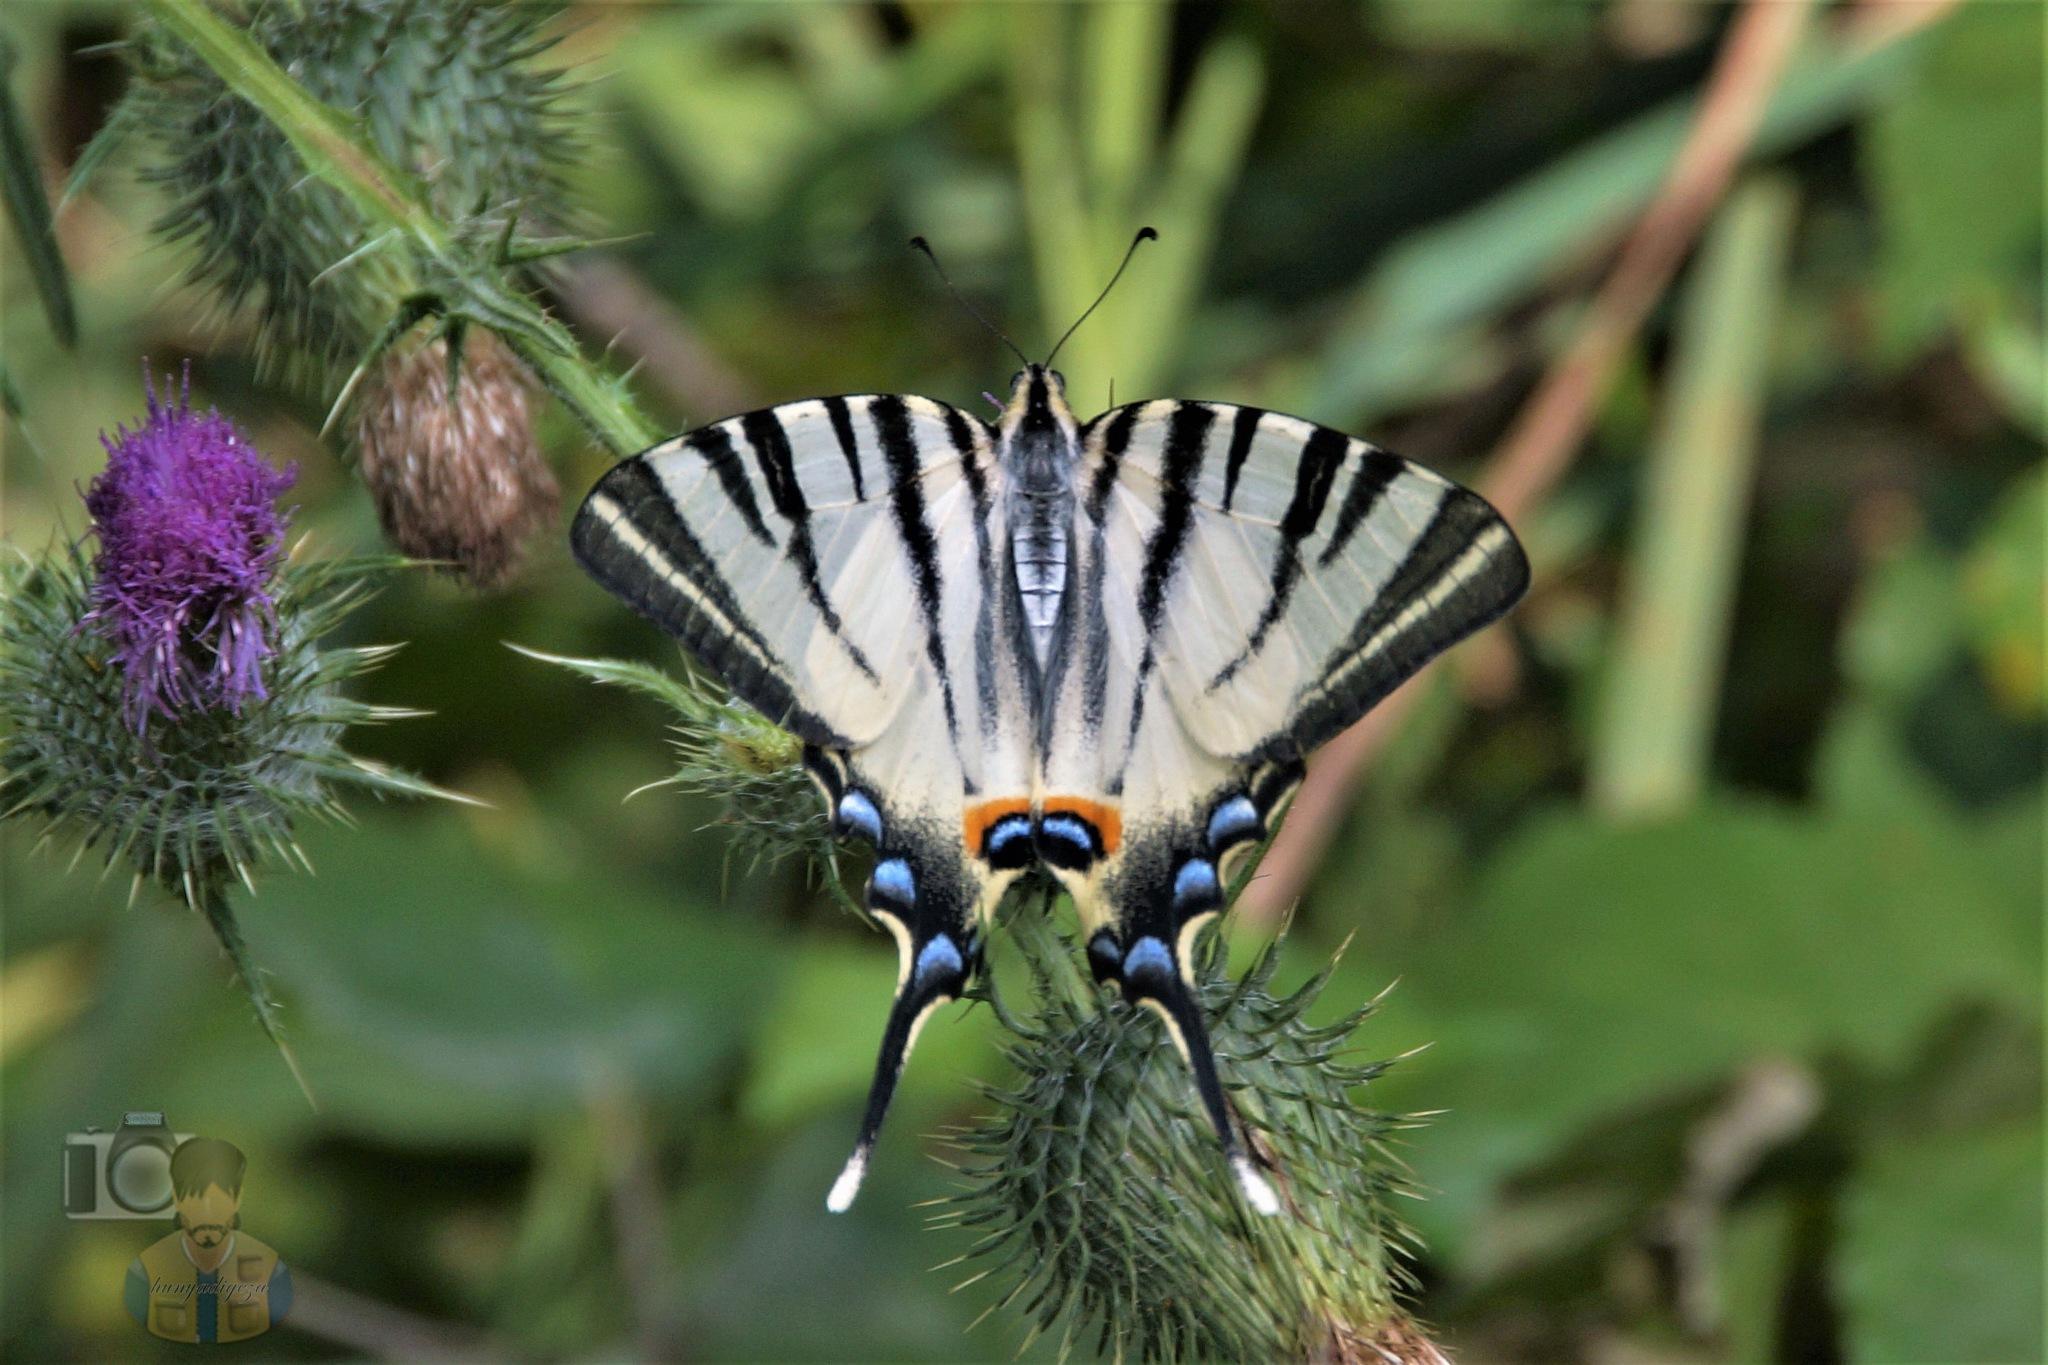 Aug.07, The scarce swallowtail by hunyadigeza